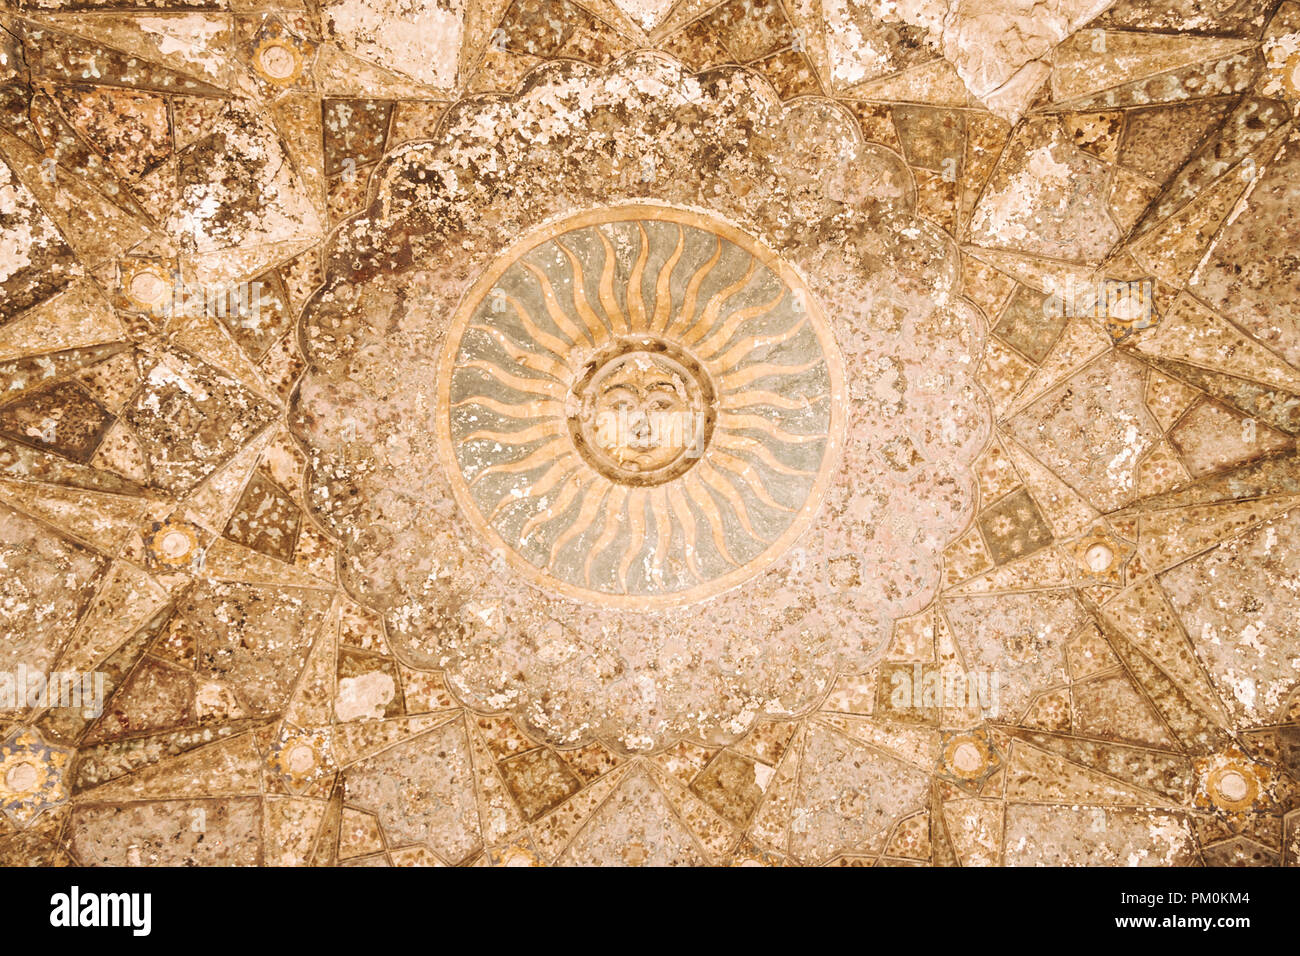 Lahore, Punjab, Pakistan, South Asia : Sun painting at an ornate ceiling inside the Mughal era Shahi Qila or Lahore Fort. Stock Photo